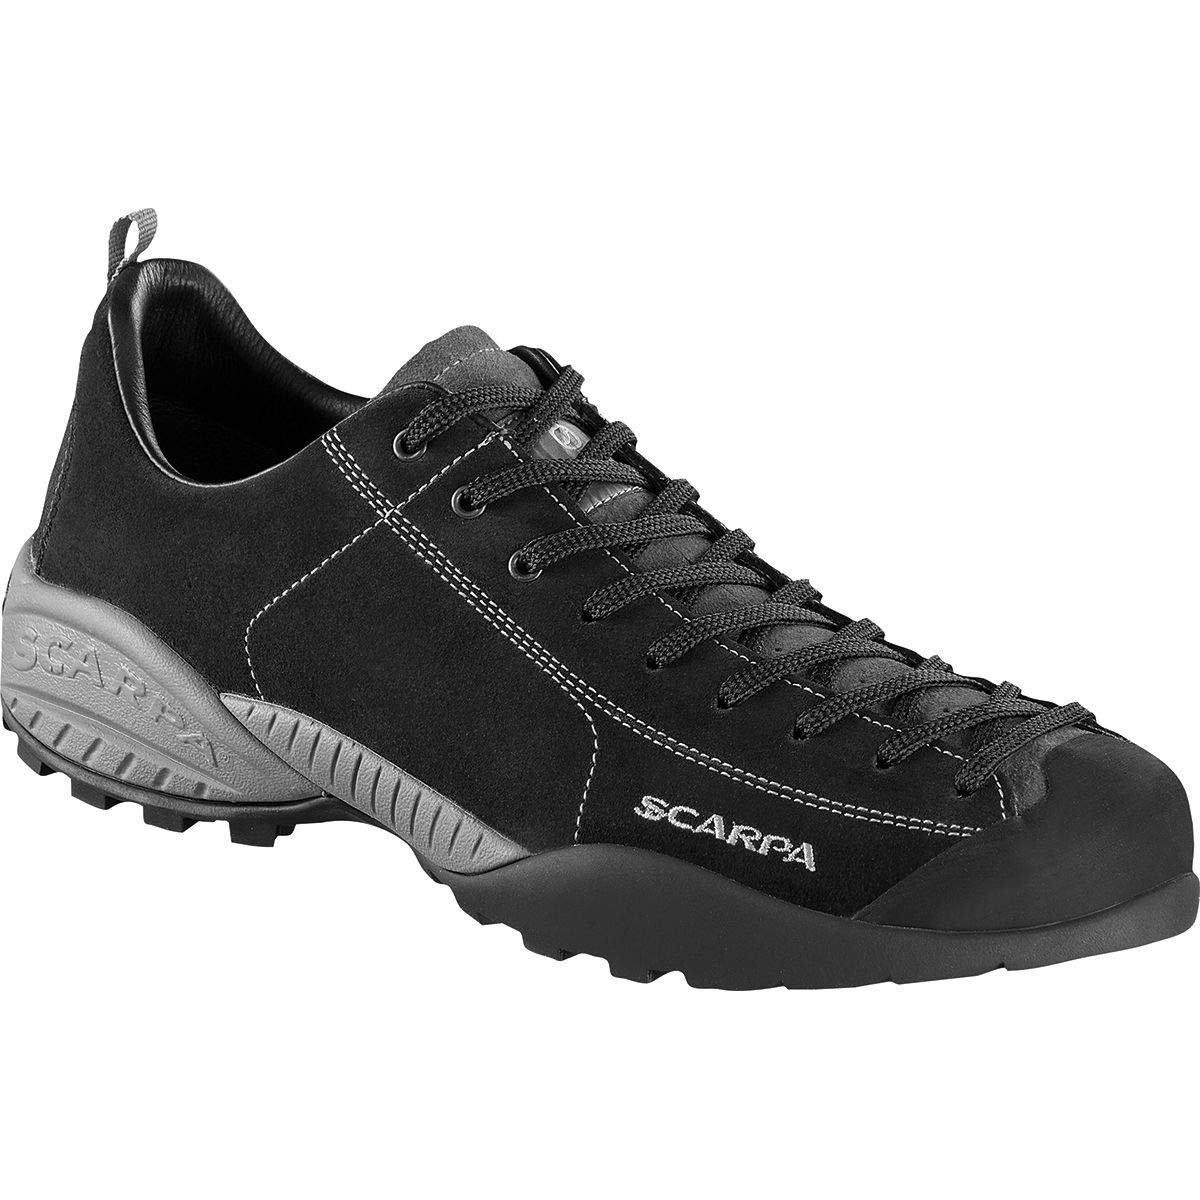 Scarpa Schuhe Mojito Leder Größe 41 midgrau